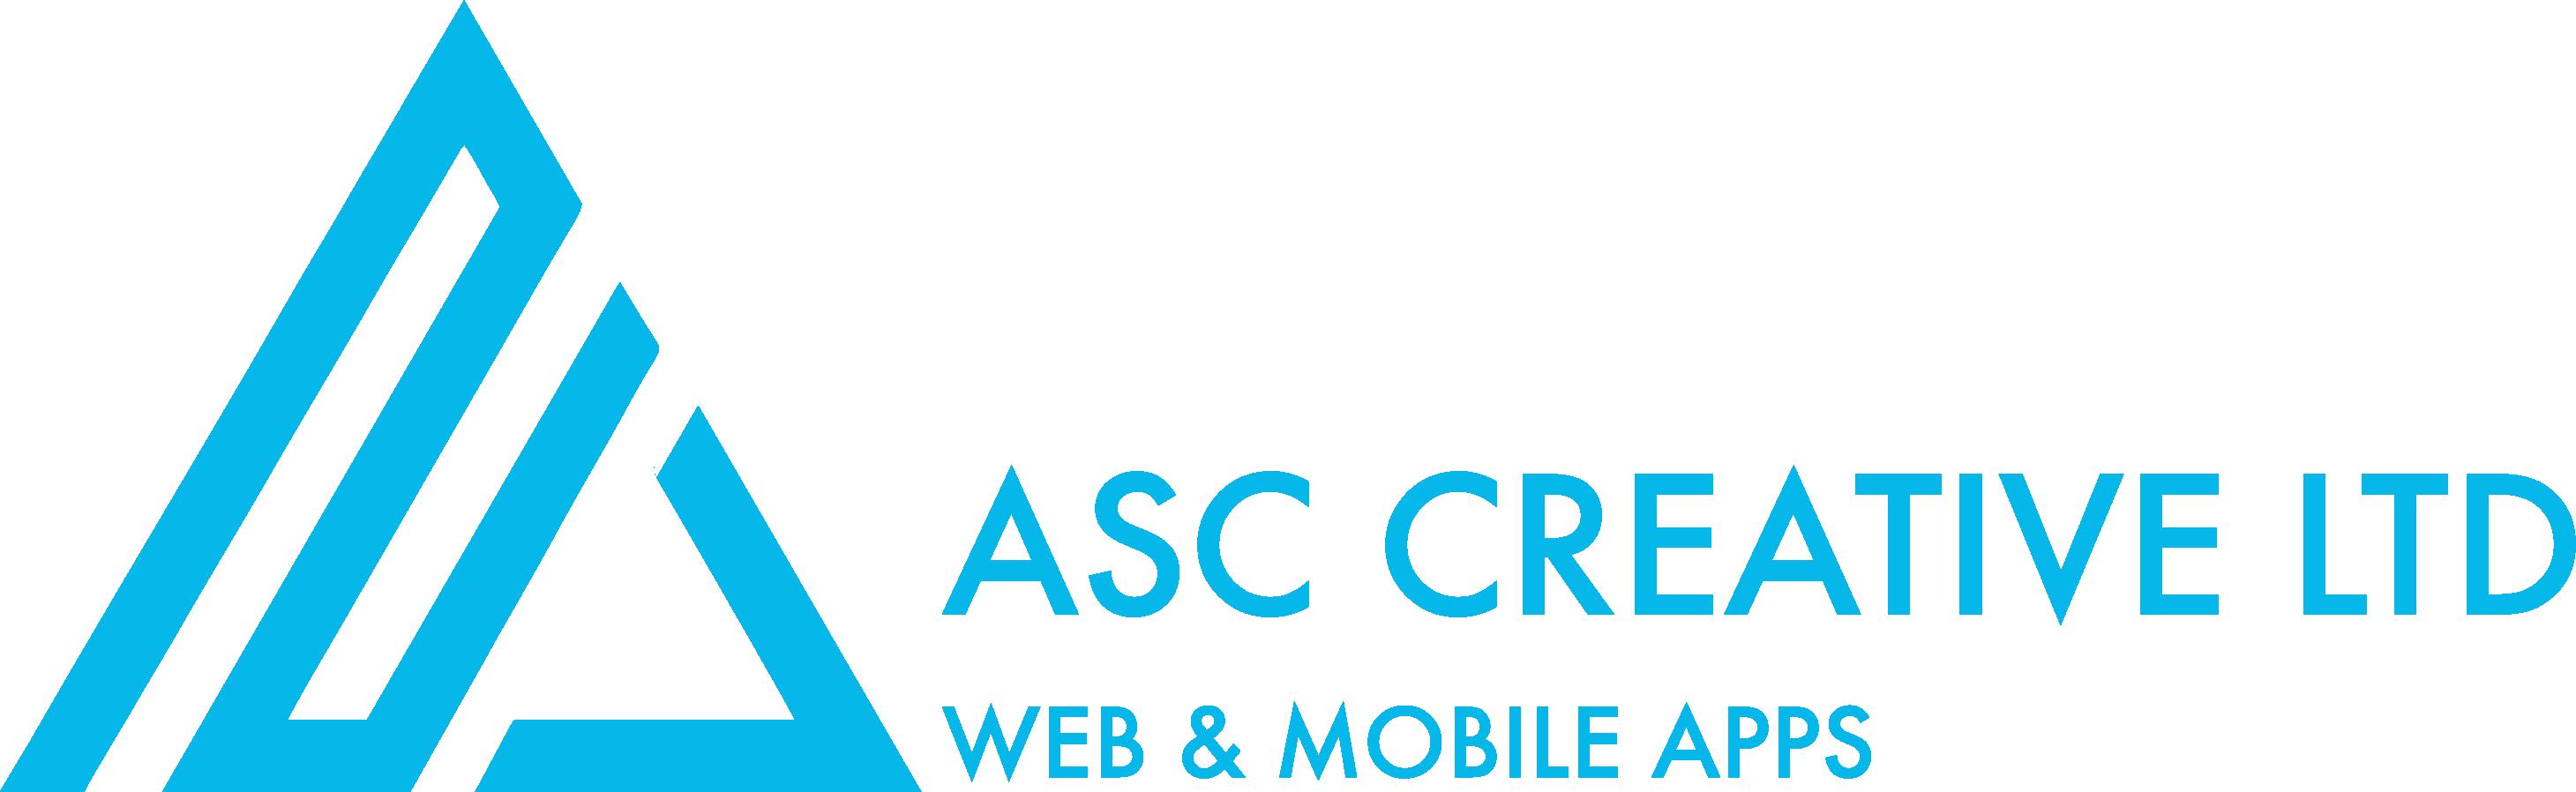 ASC Creative Ltd.